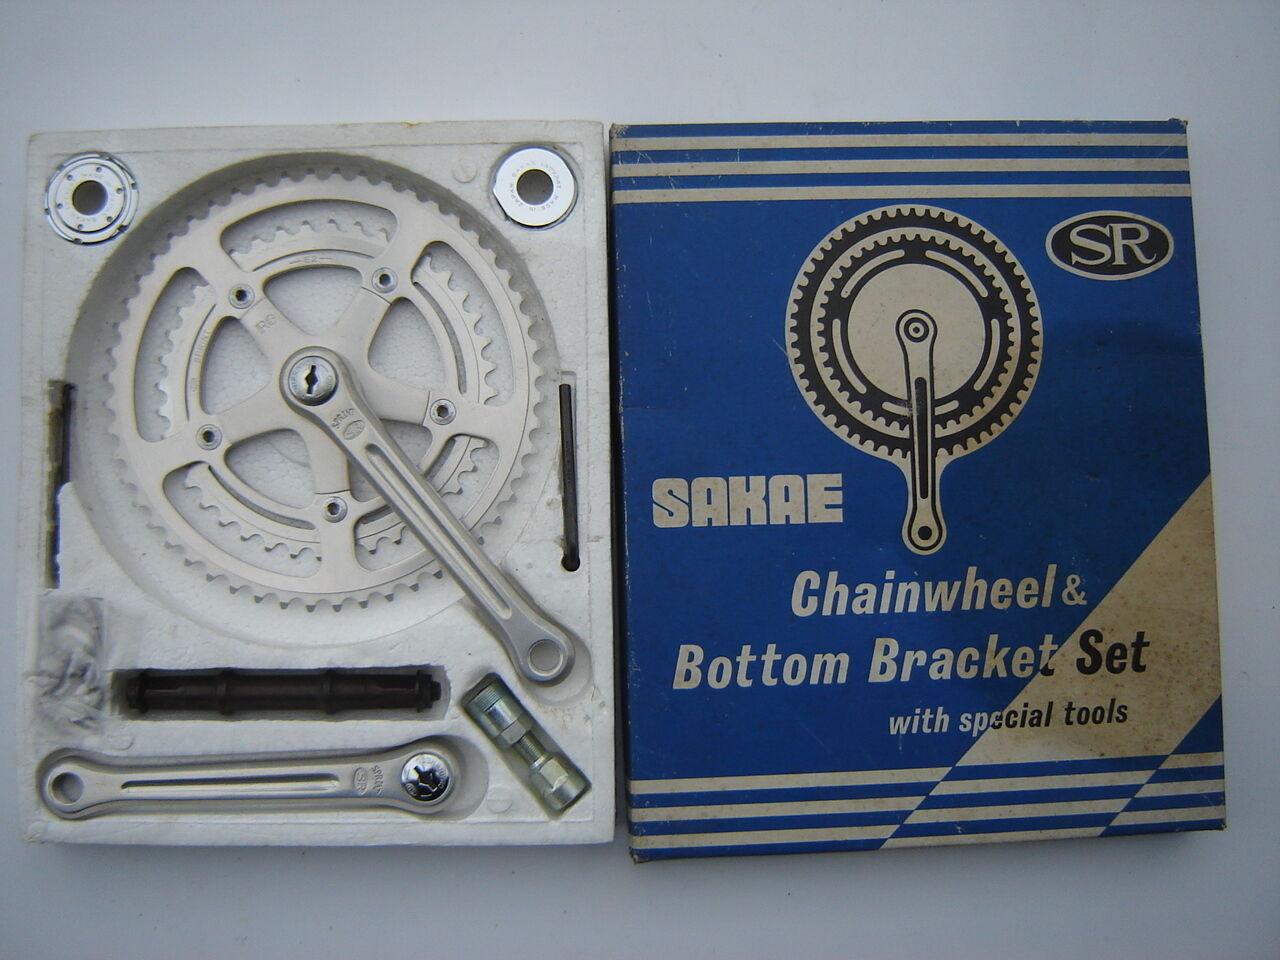 SAKAE RINGYO SR SPRINT RG CRANKSET 40 52  165 mm + ENGLISH BB + TOOLS - NOS -NIB